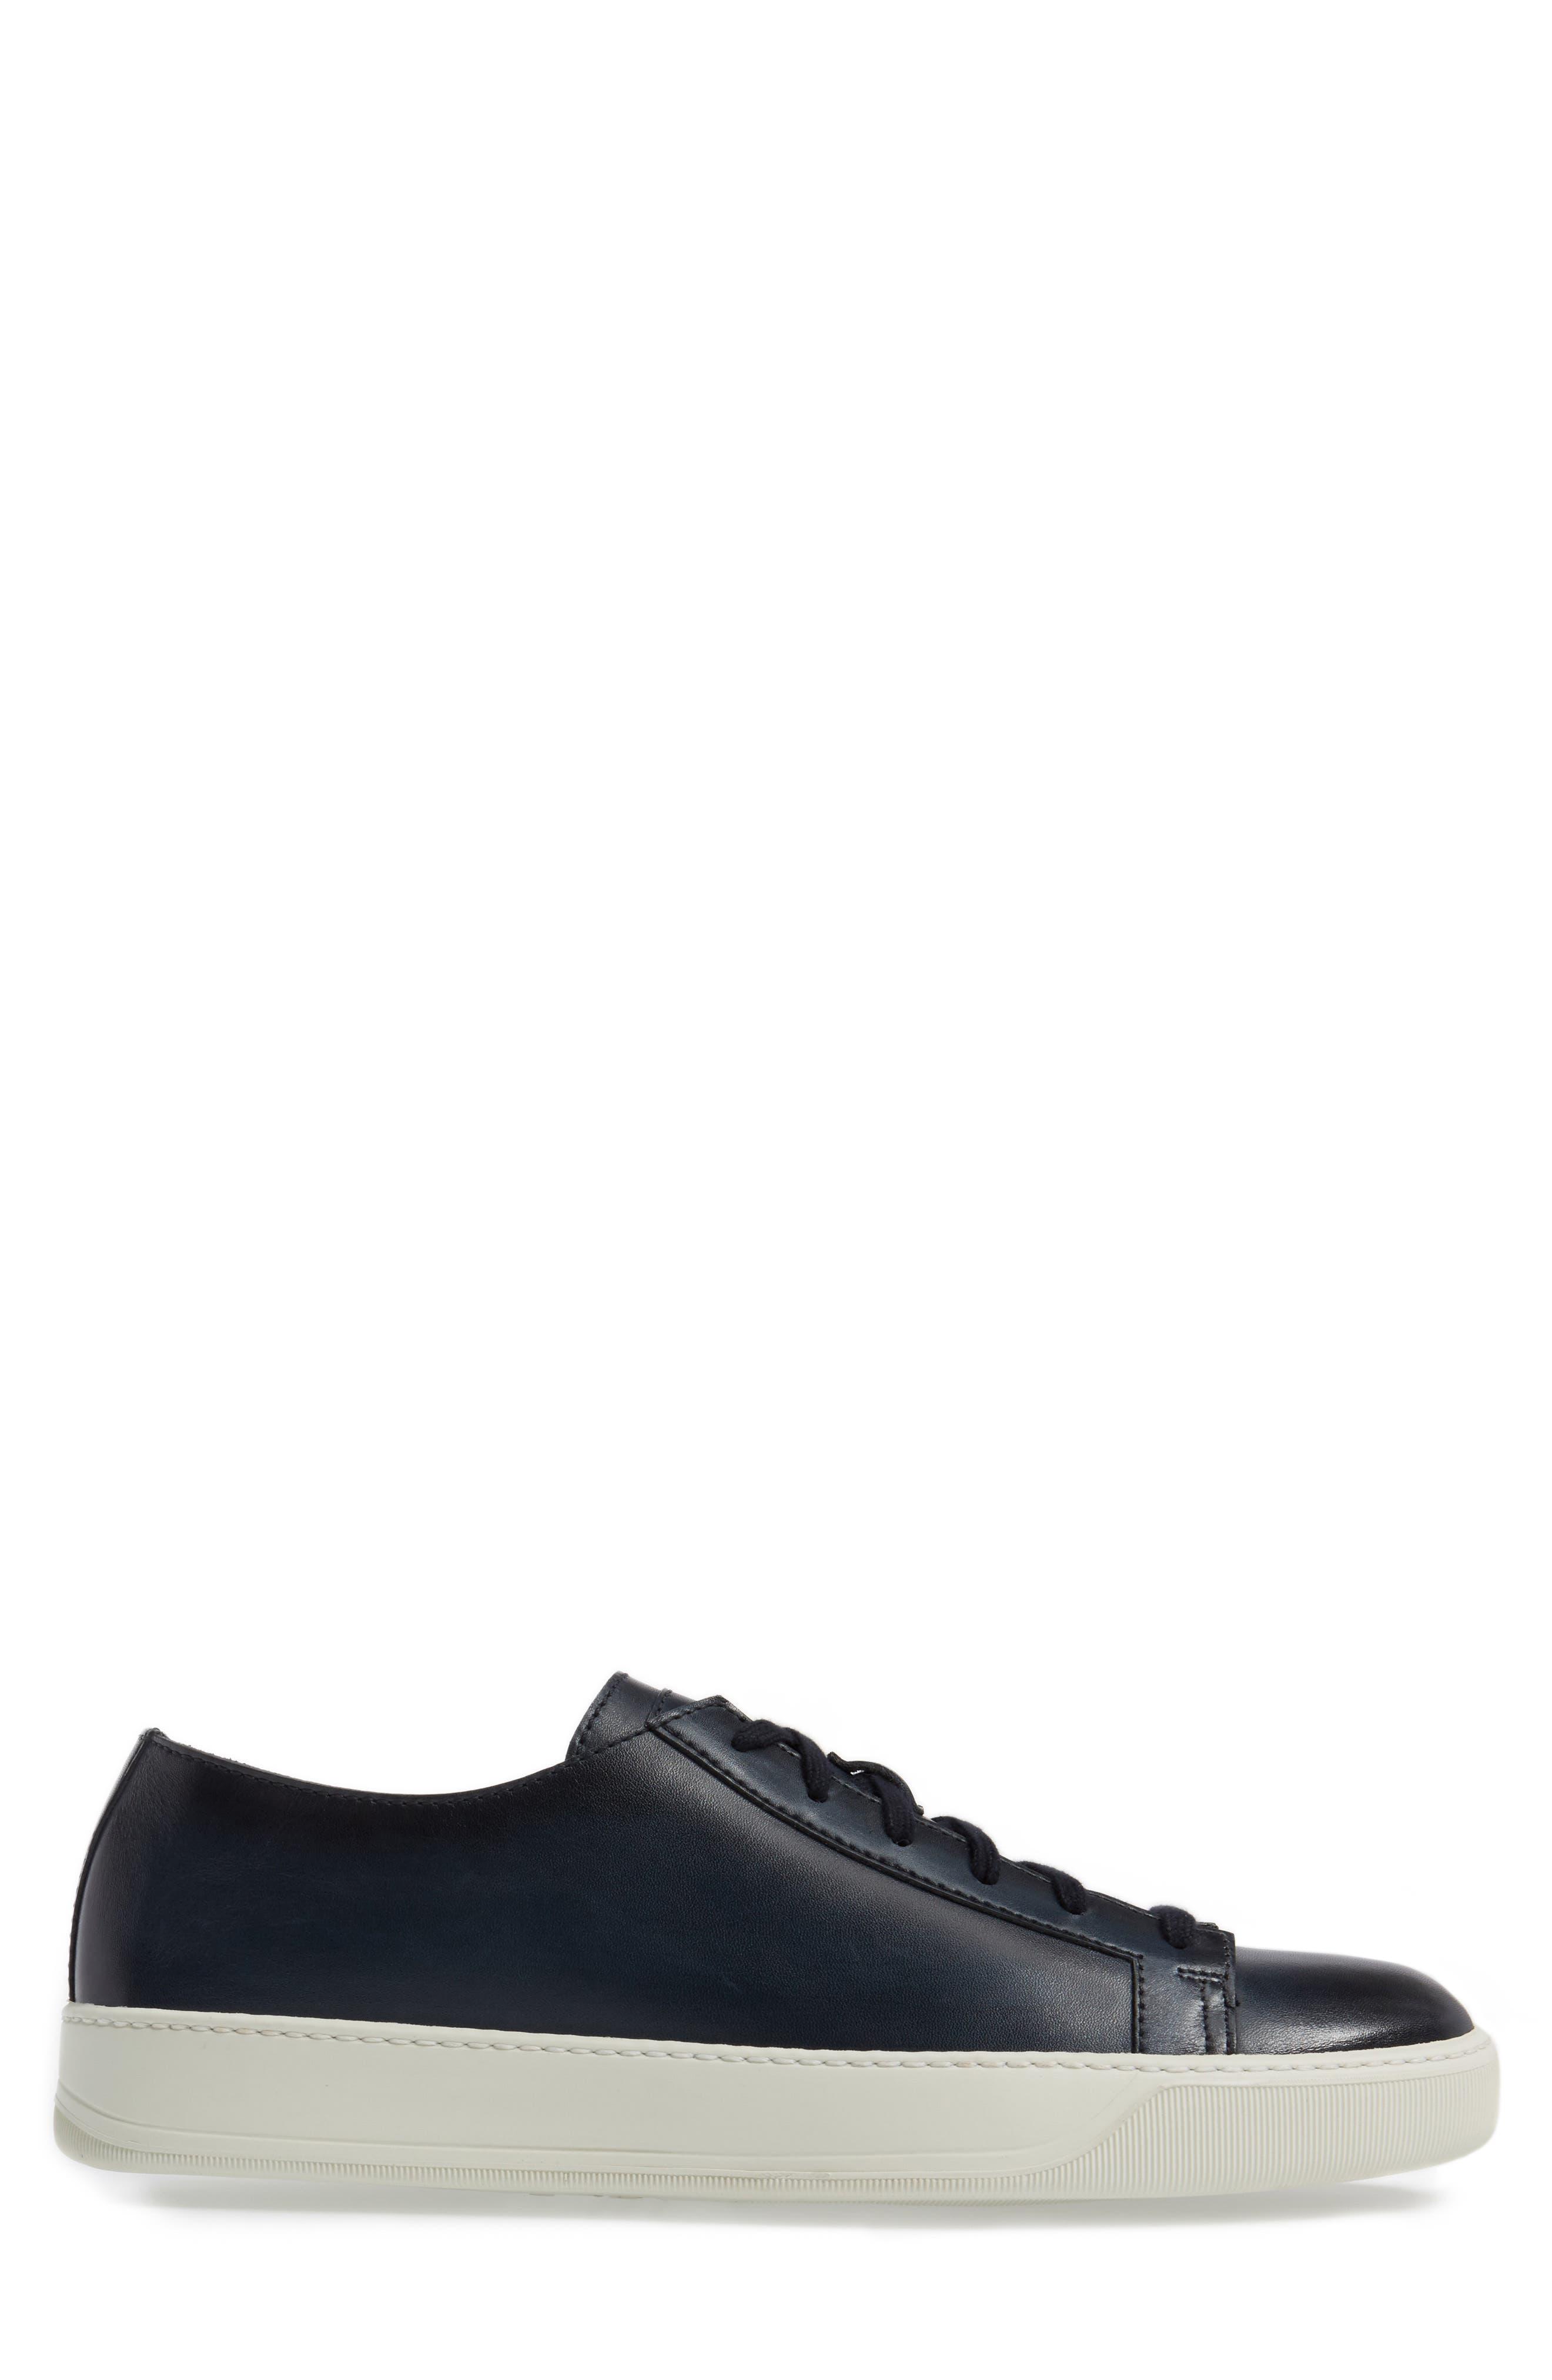 Cleanic Sneaker,                             Alternate thumbnail 14, color,